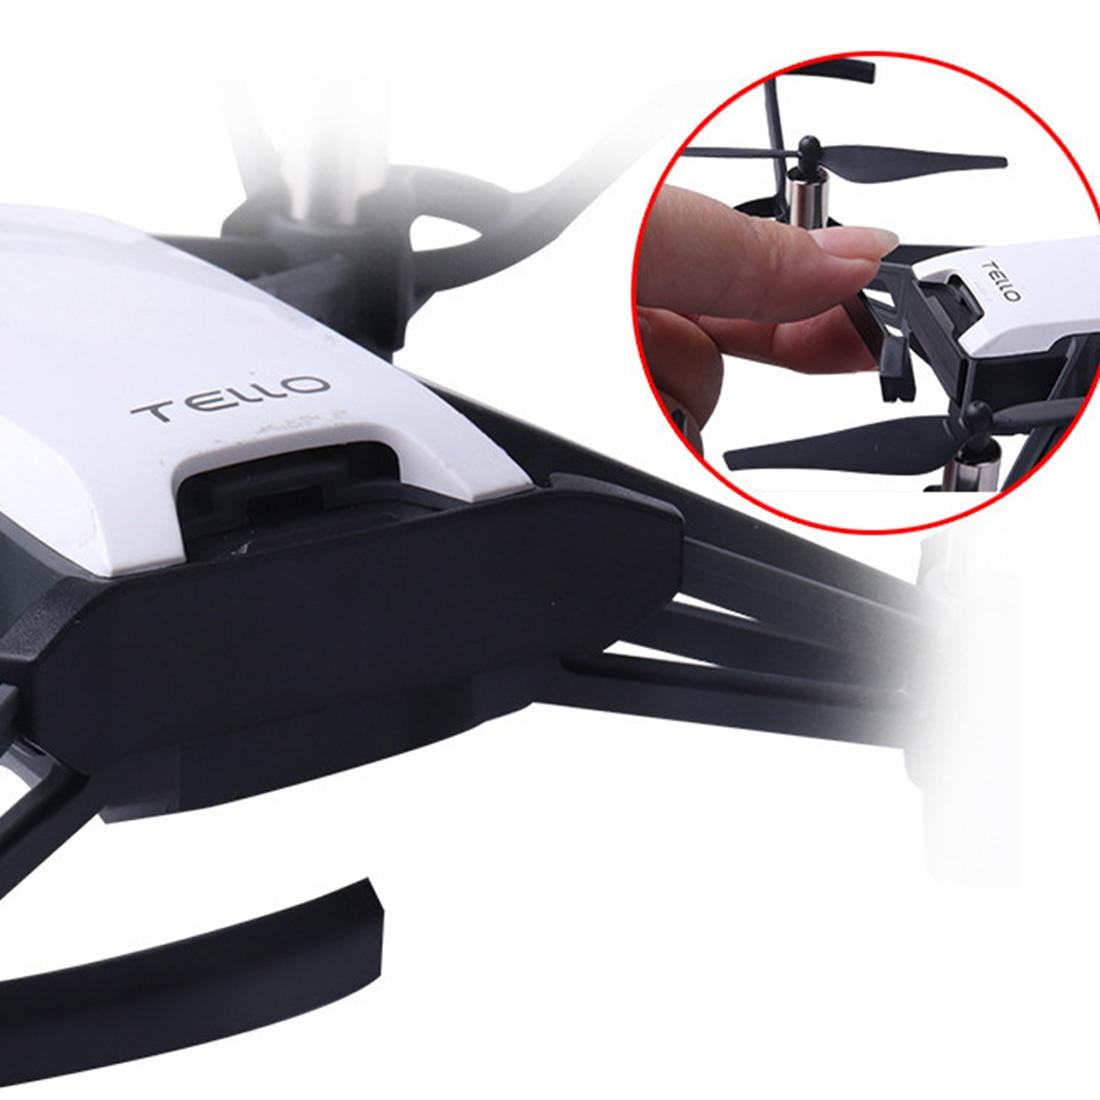 HOBBYINRC Battery Protective Cover Dustproof Plug Drop Proof Buckle for DJI Tello font b Drone b